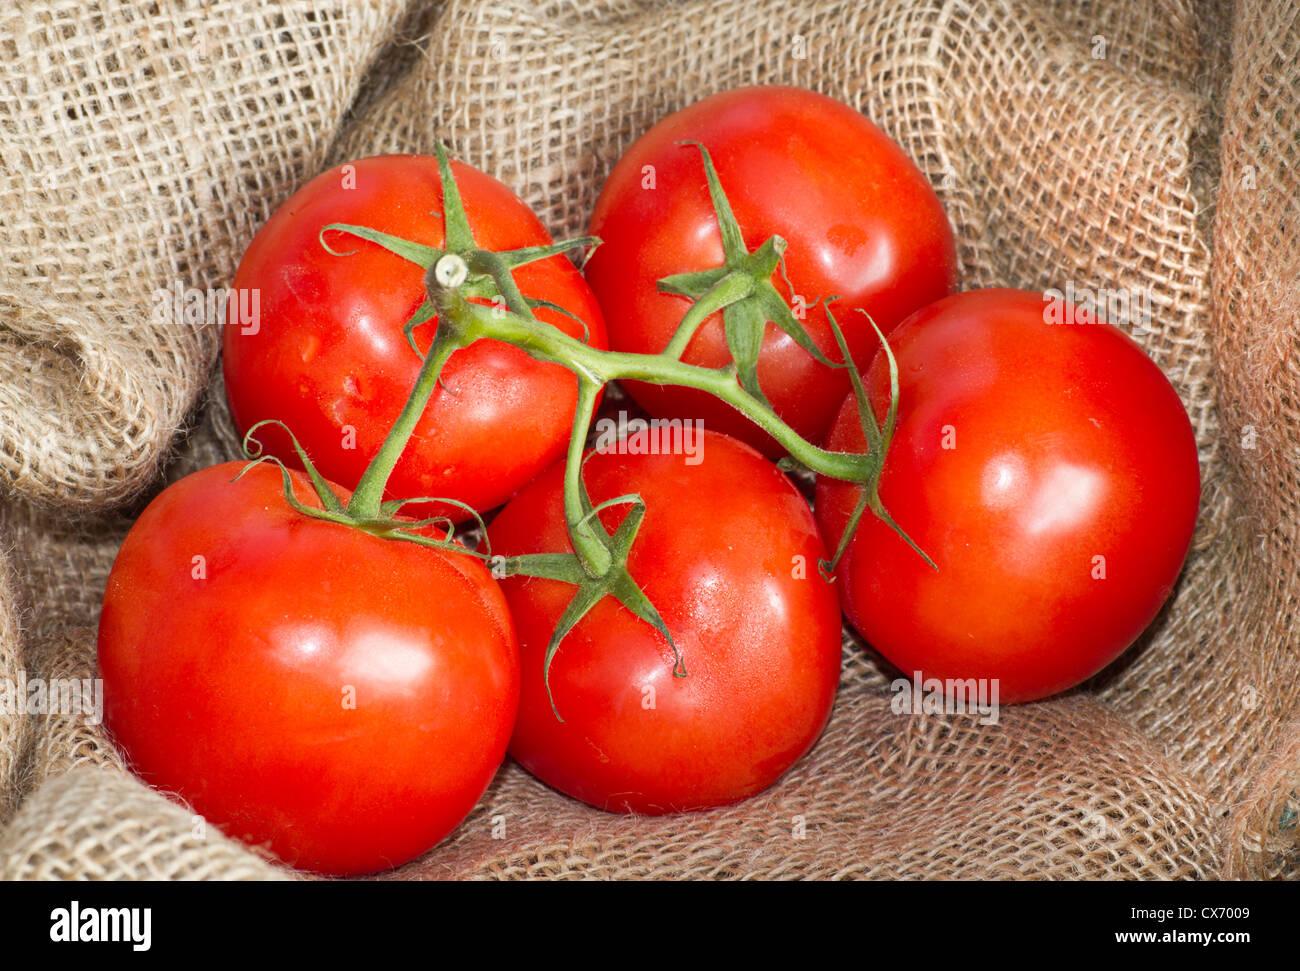 5 vine tomatoes with stalks on hessian sacking - Stock Image